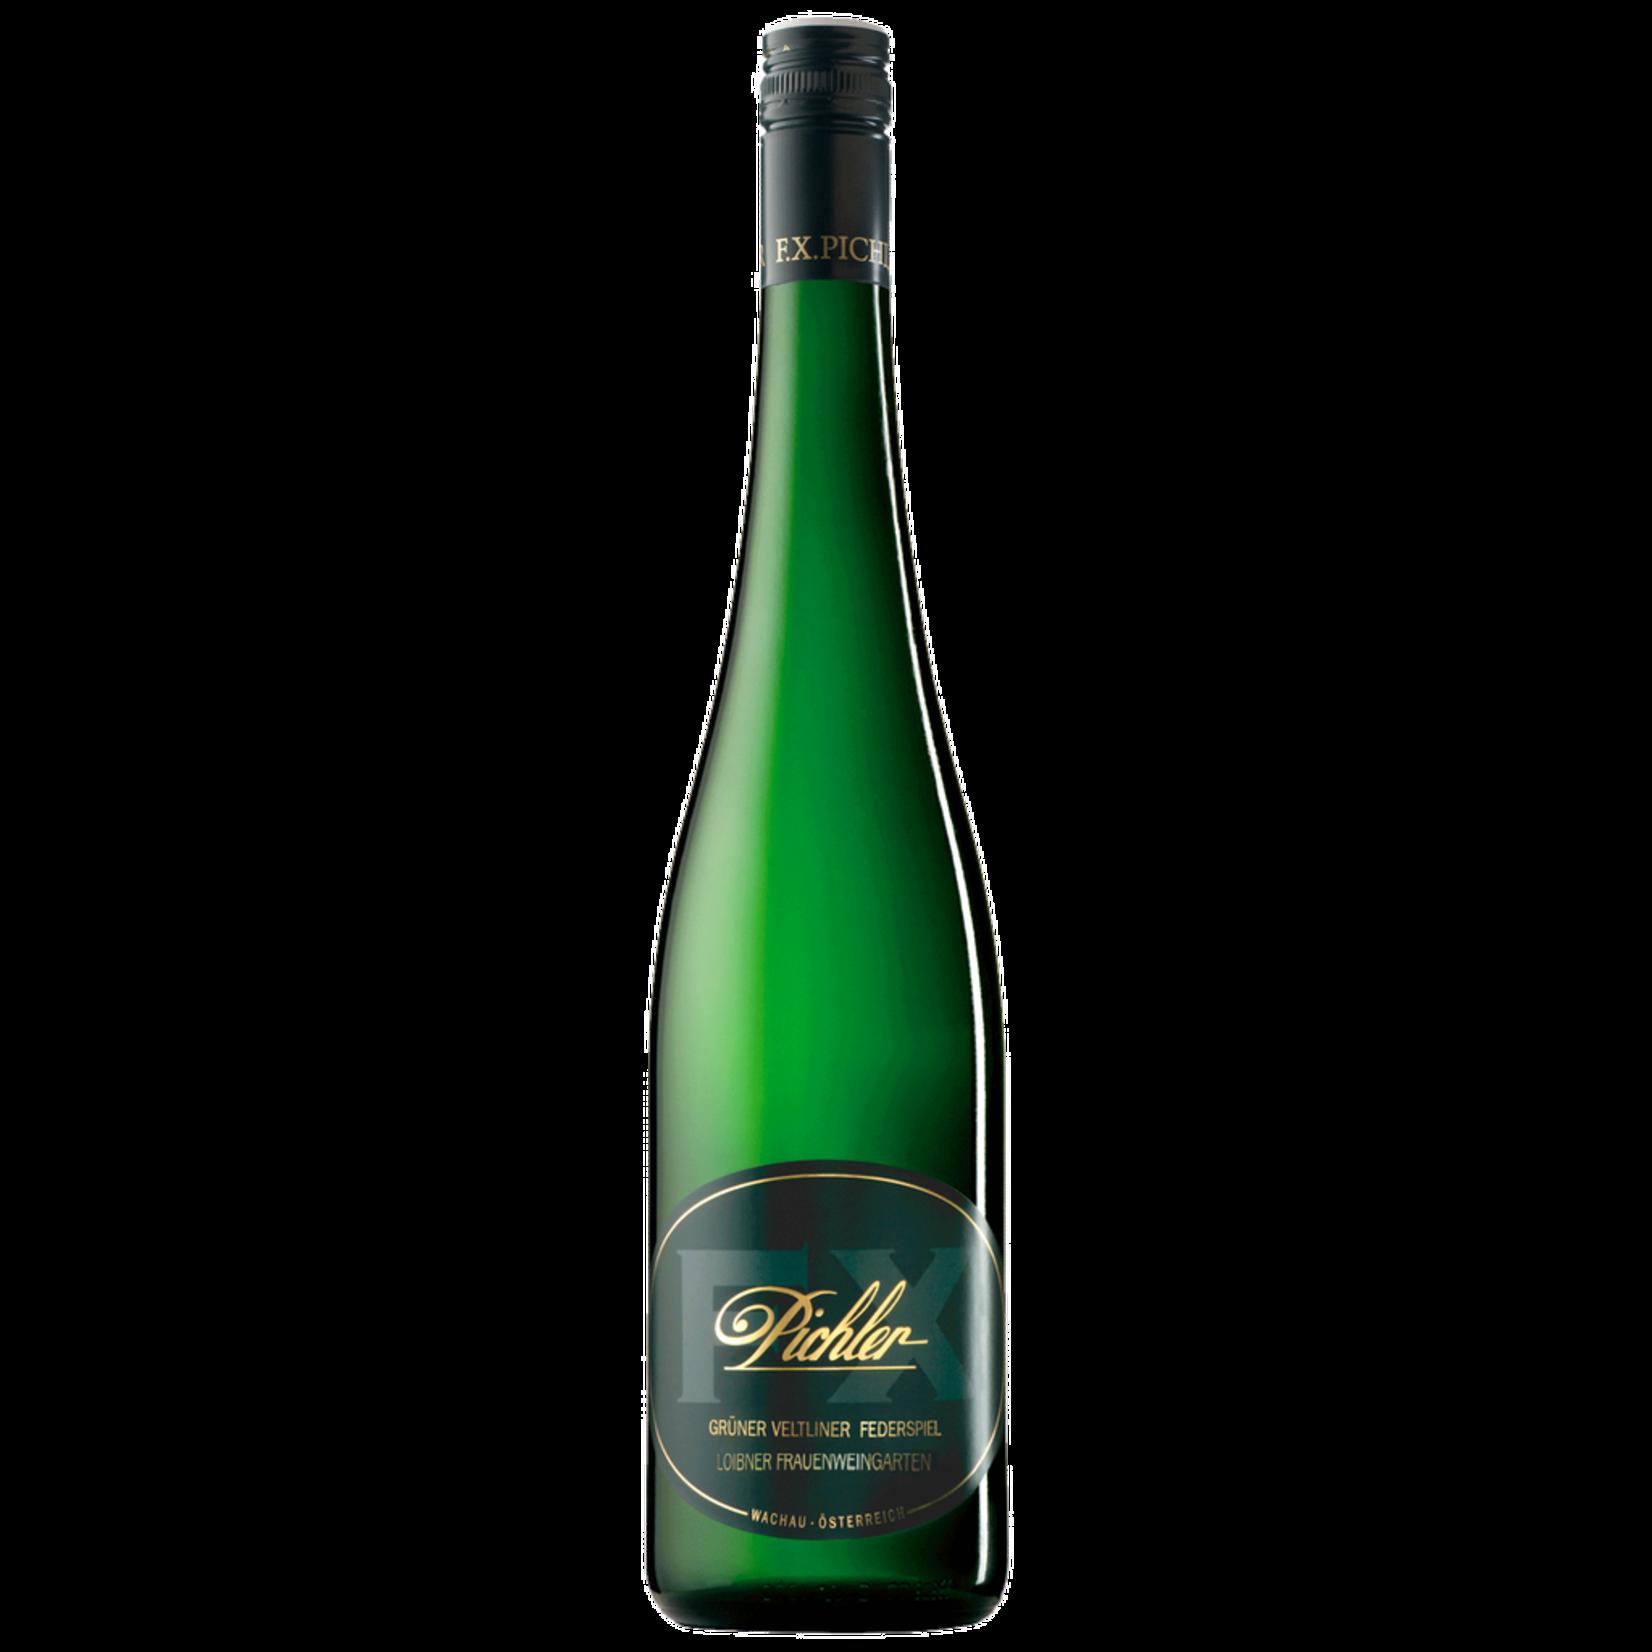 Wine FX Pichler Gruner Veltliner Loibner Federspiel 2018